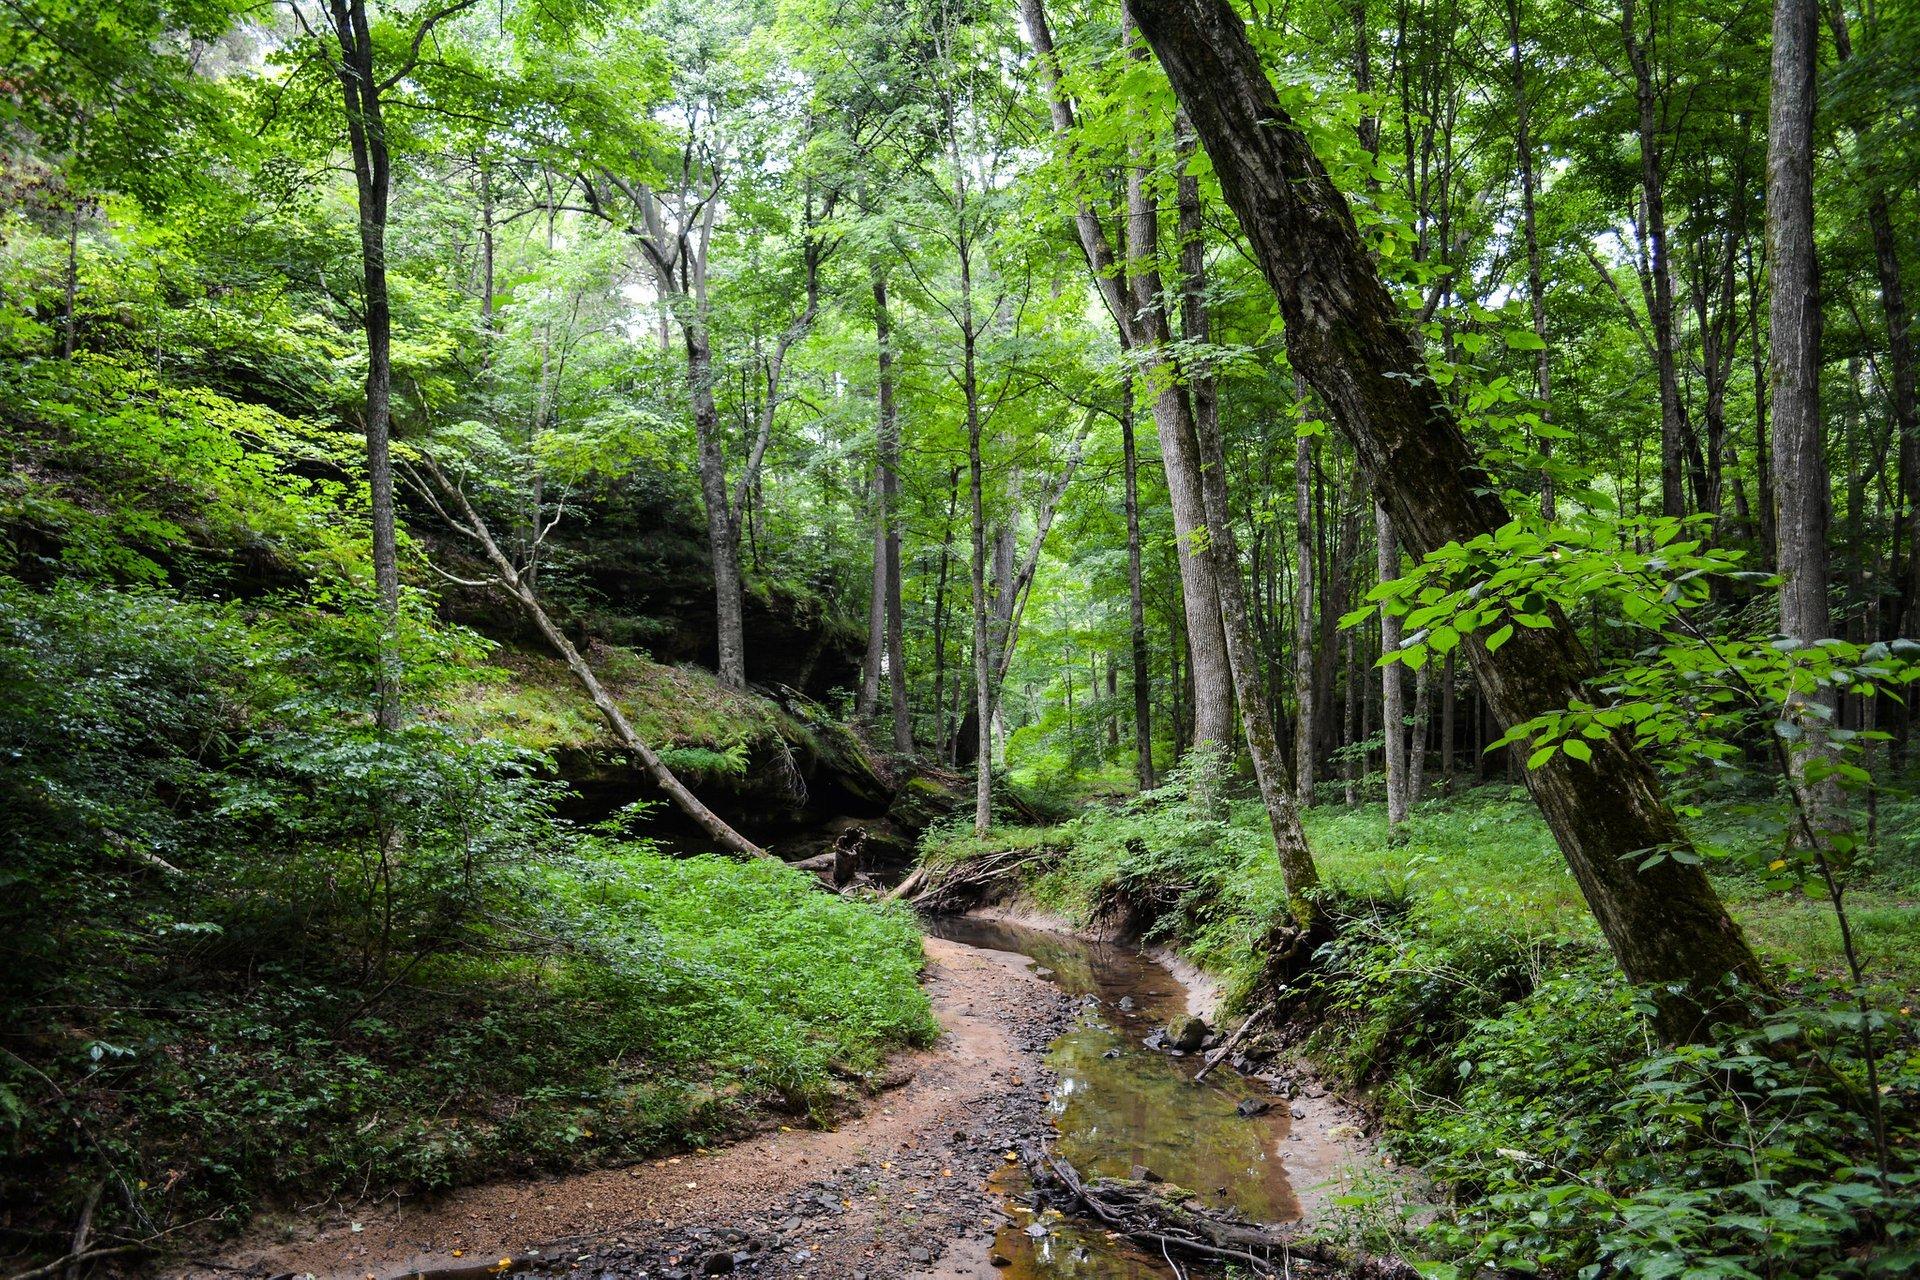 Rim Rock Trail in Shawnee National Forest, Illinois 2020